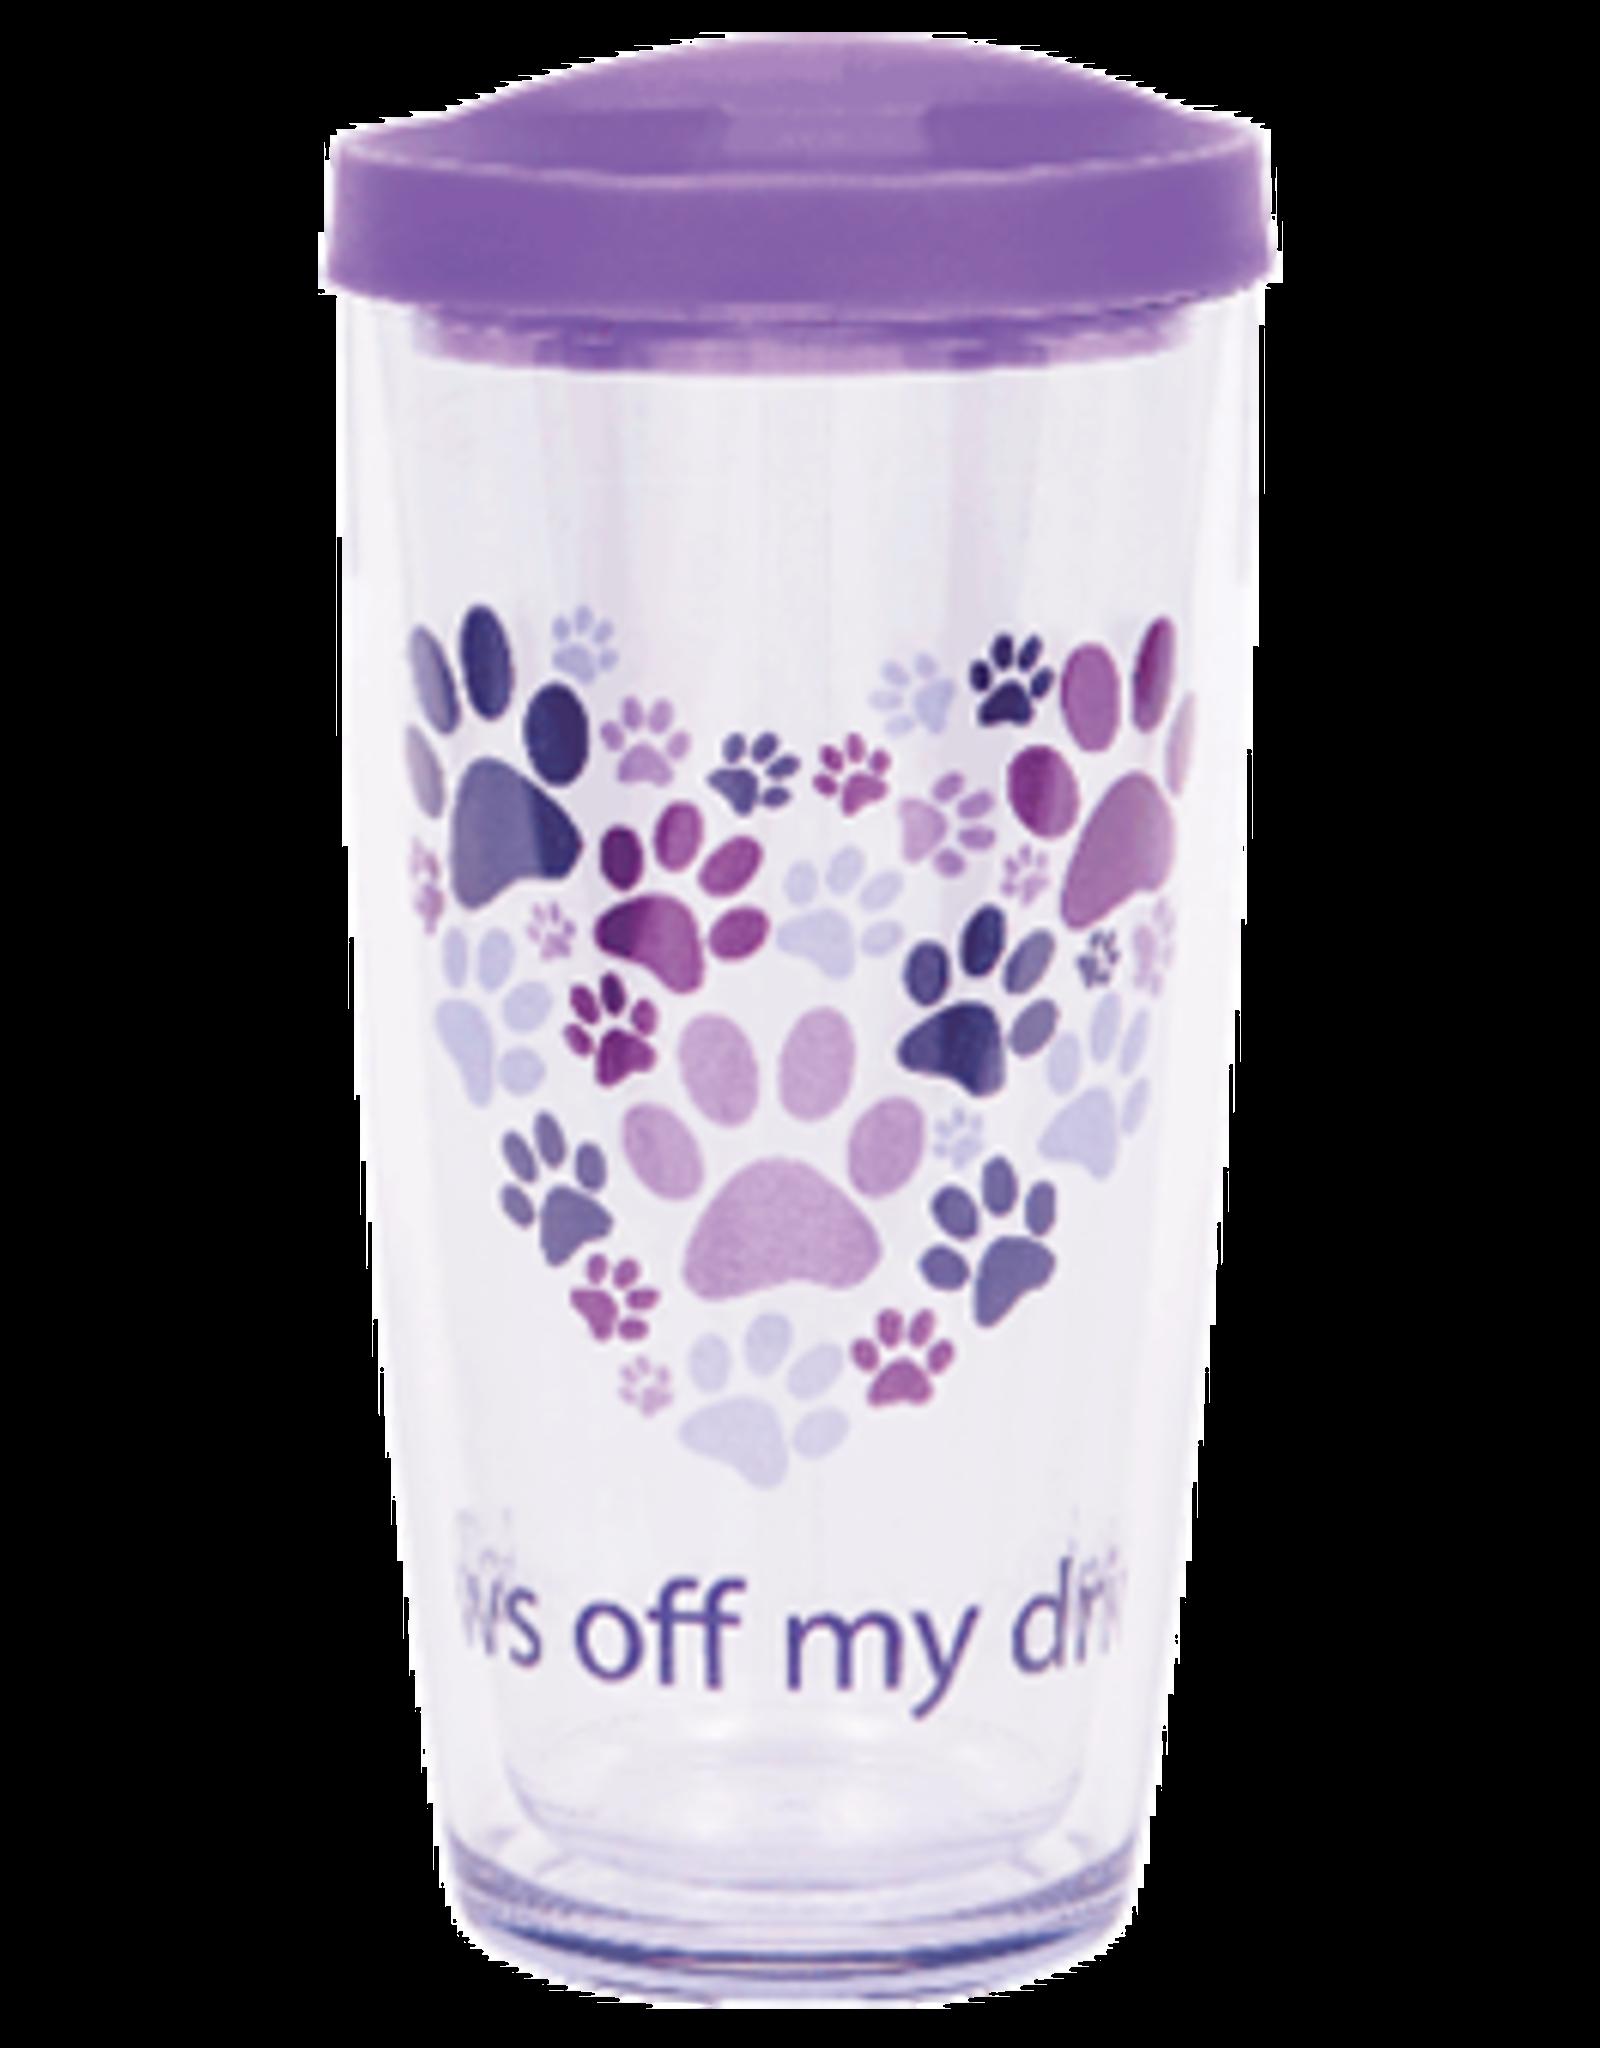 Dog Speak 16oz Thermal Tumbler - Paws Off My Drink